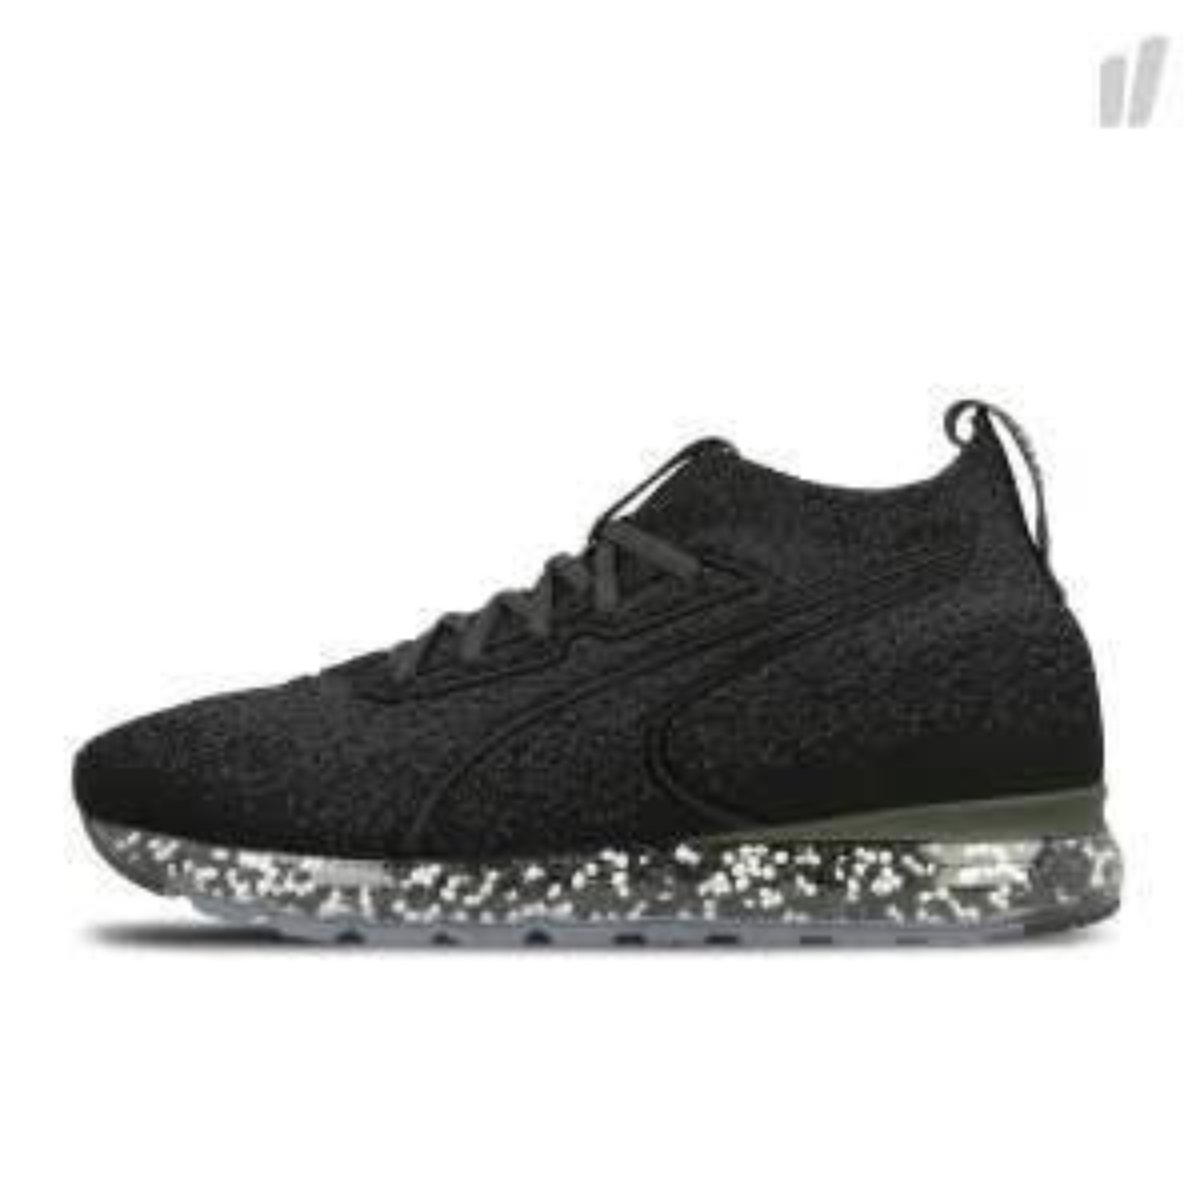 Puma Jamming | Black - Forest Night | Gößen 41-45 | Herren Sneaker